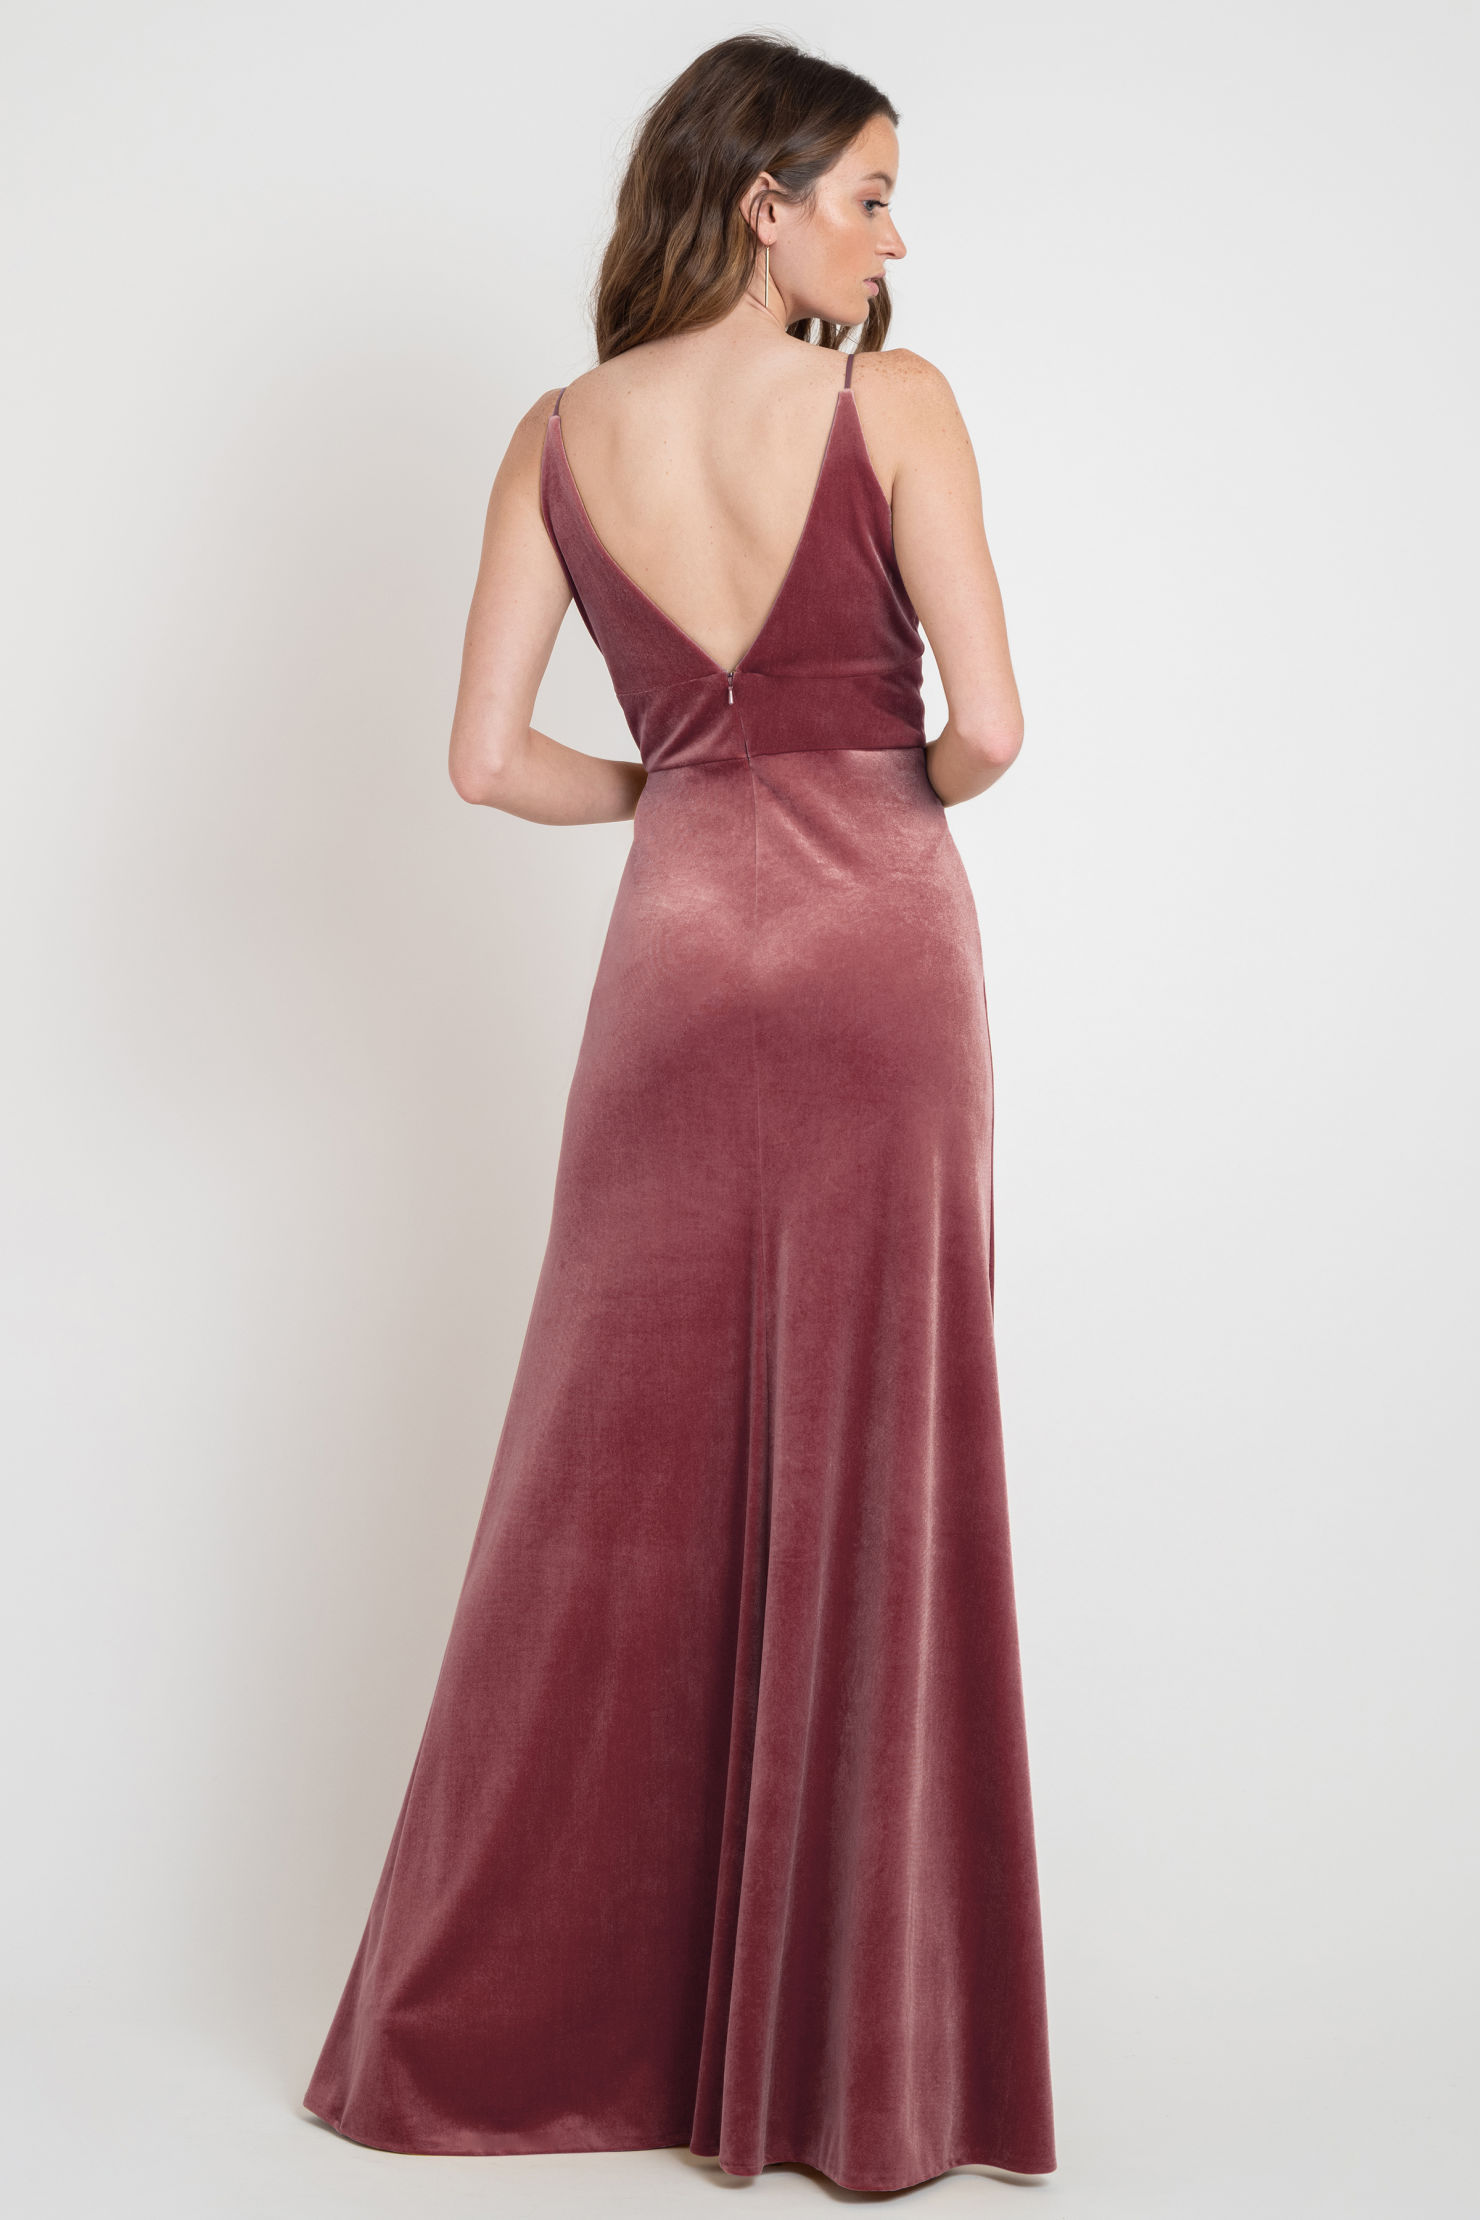 Madden Bridesmaids Dress by Jenny Yoo - Cinnamon Rose